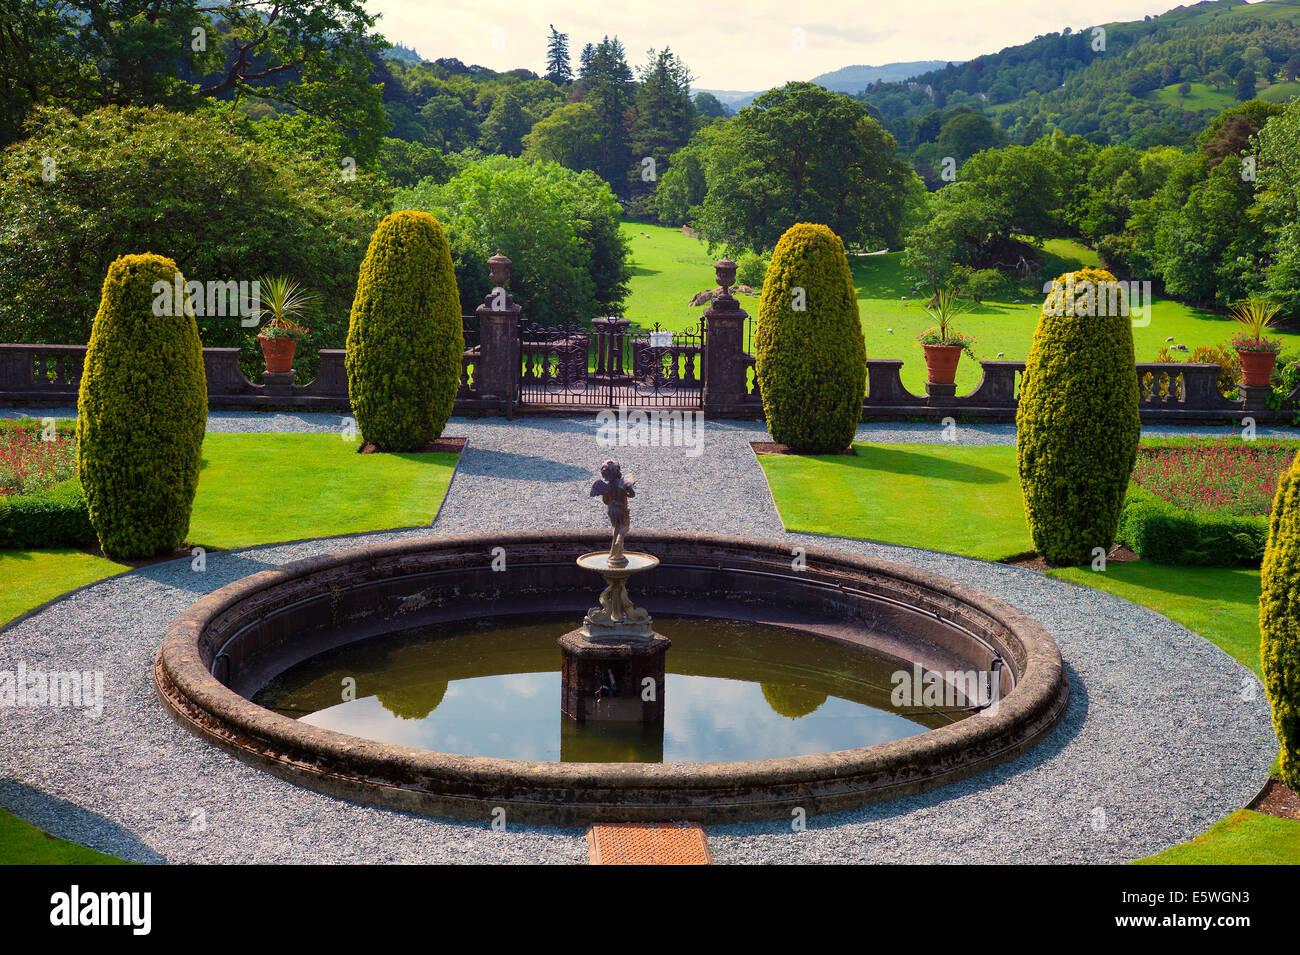 Circular pool in formal garden at Rydal Hall Cumbria UK - Stock Image